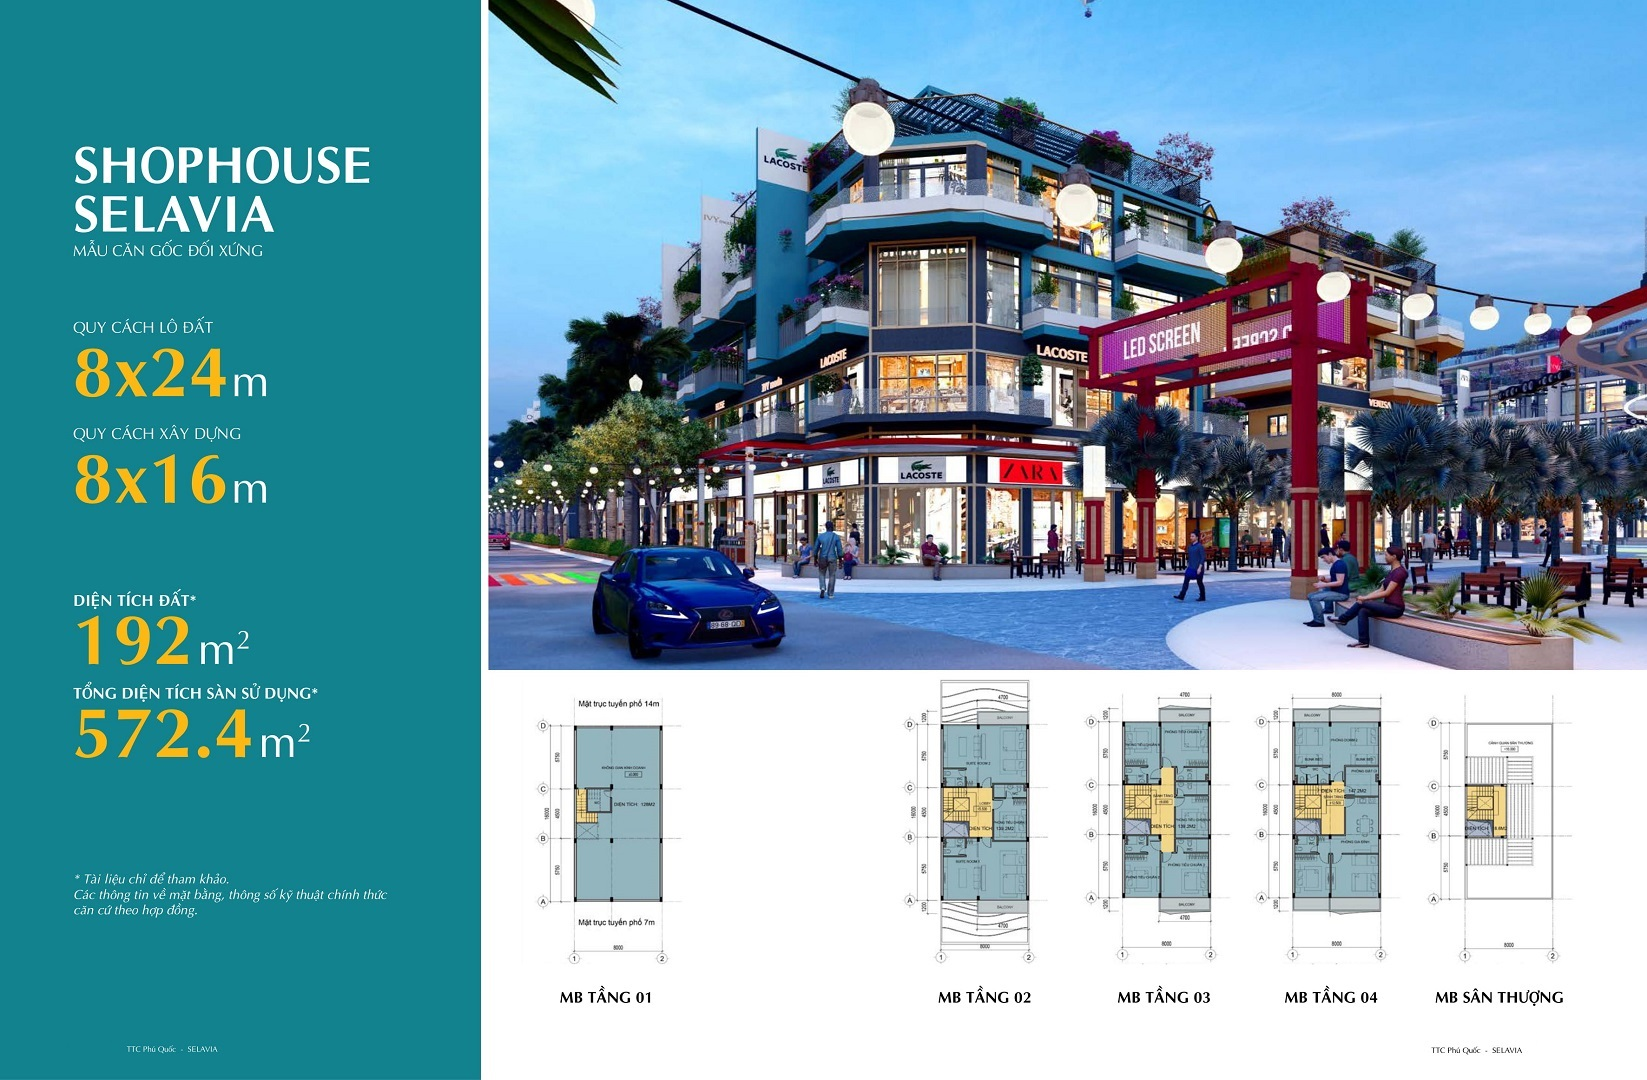 thiết kế shophouse selavia phú quốc mẫu 3